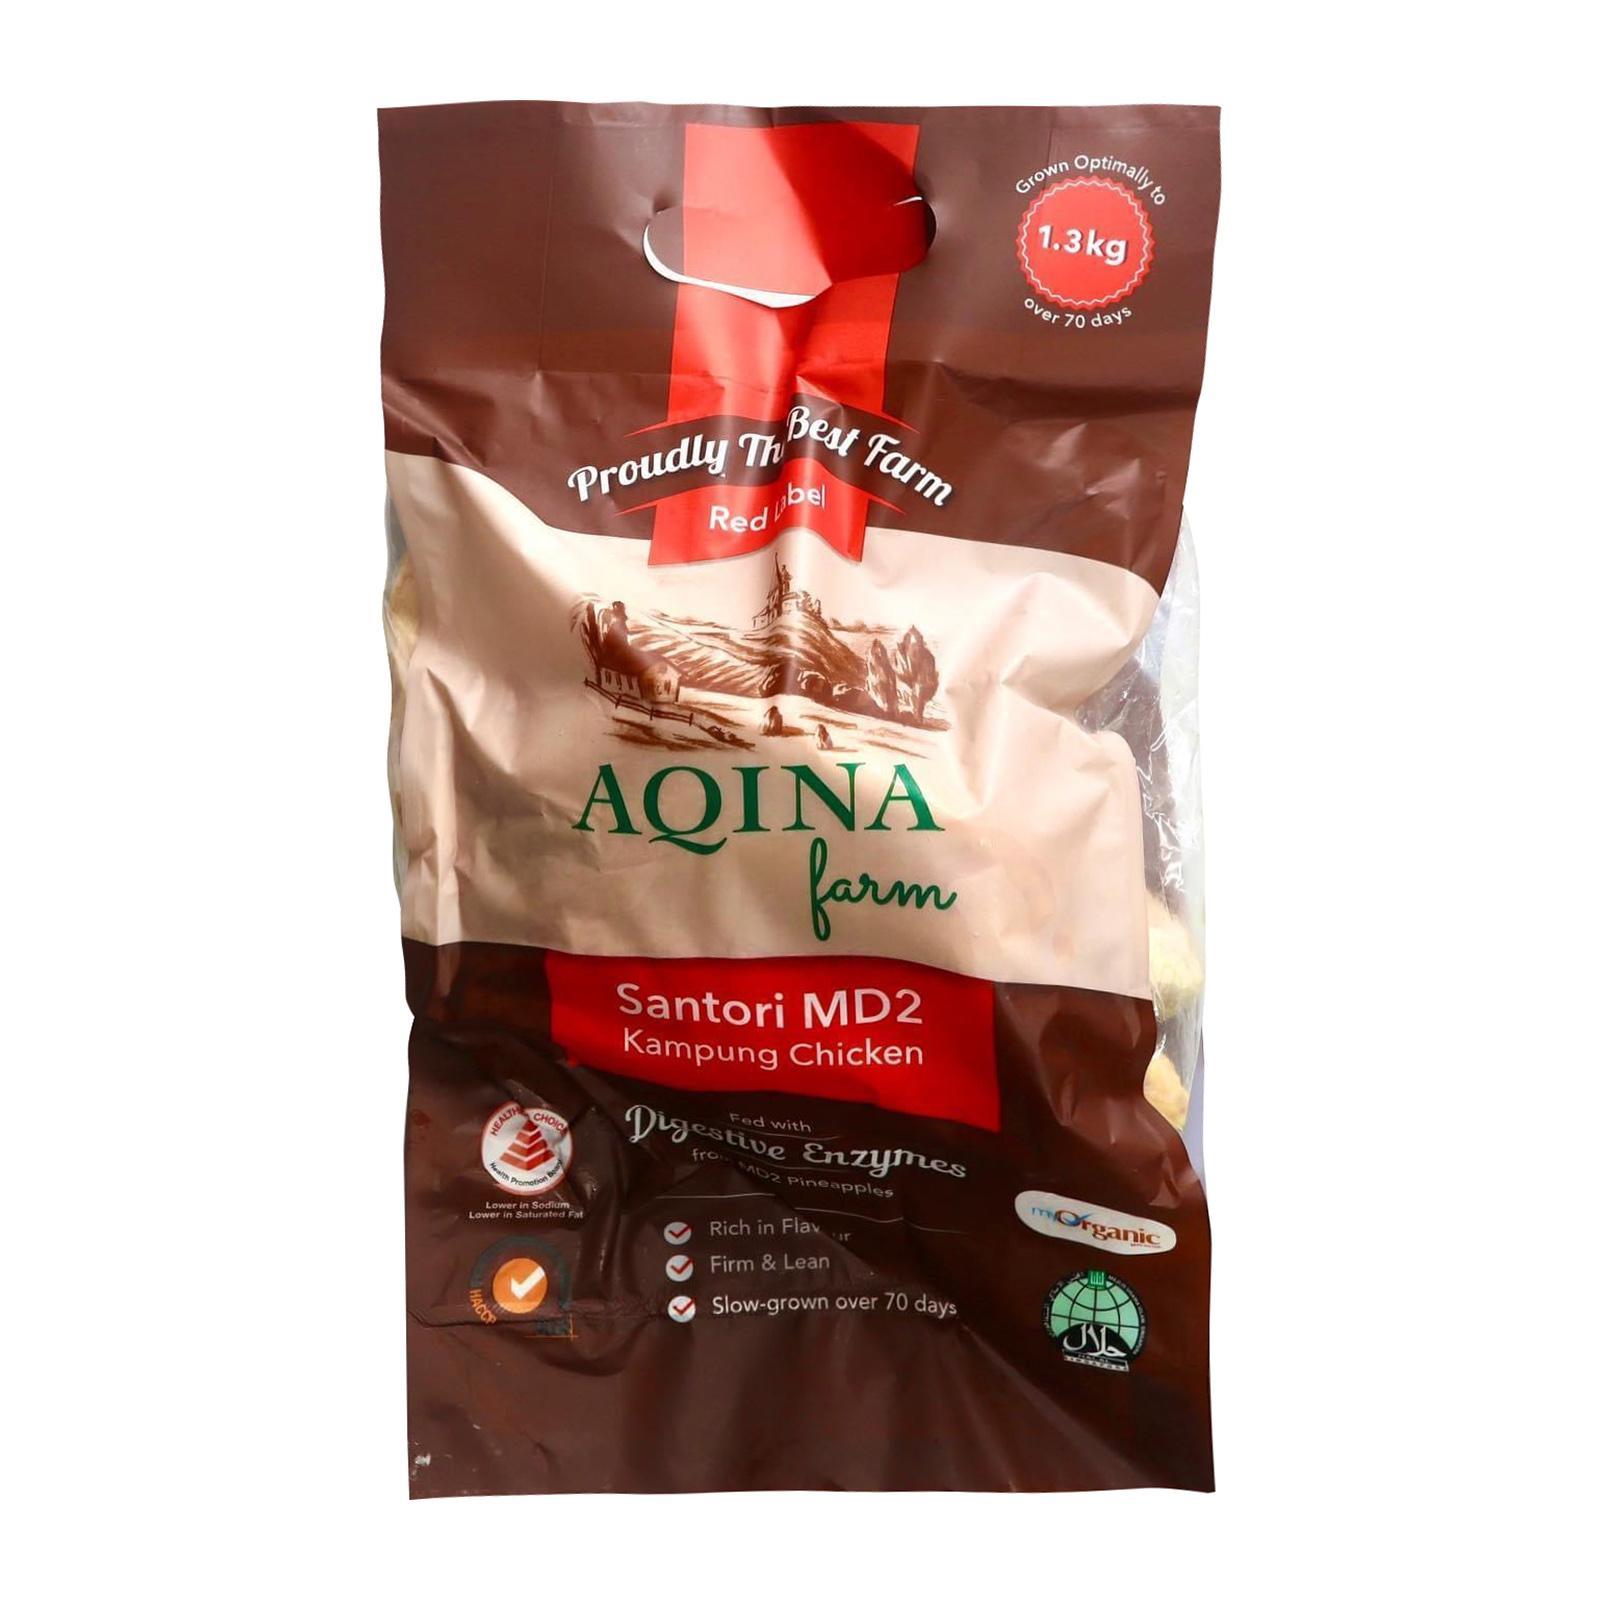 Master Grocer Fresh Organic MD2 Kampung Chicken Whole 1.3kg